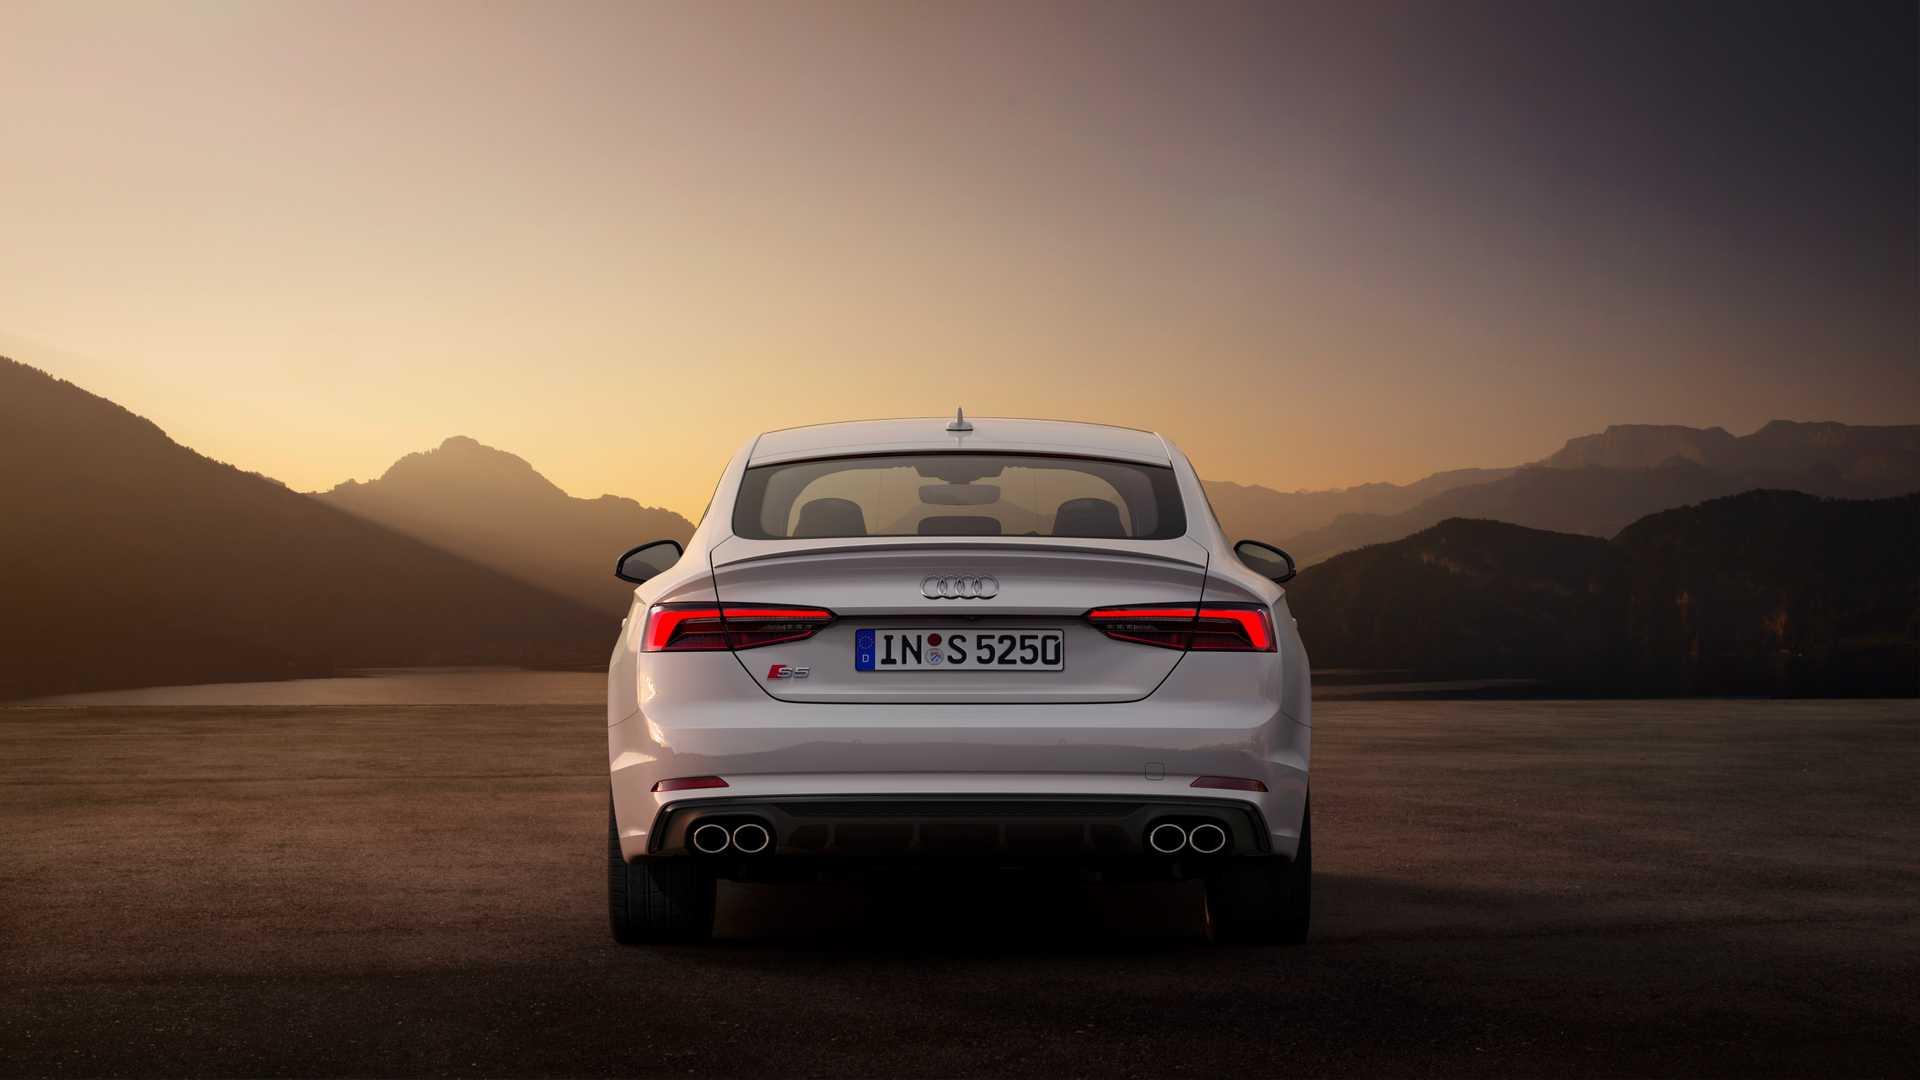 2019 Audi S5 Sportback TDI Rear Wallpaper (10)